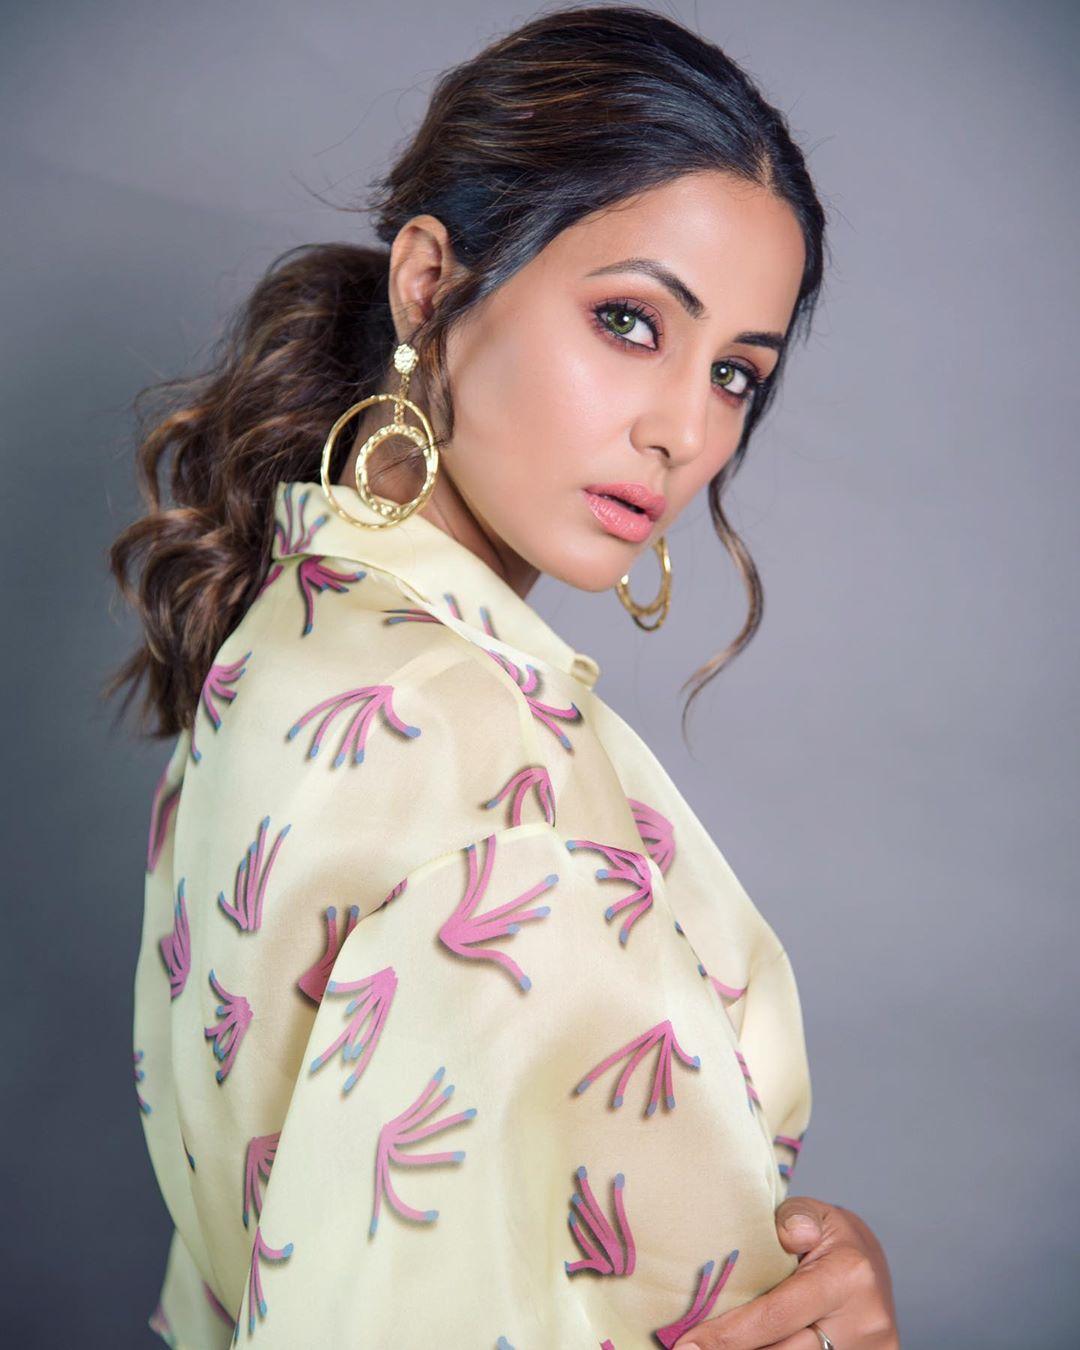 Bollywood Tadka,हिना खान इमेज, हिना खान फोटो, हिना खान पिक्चर,